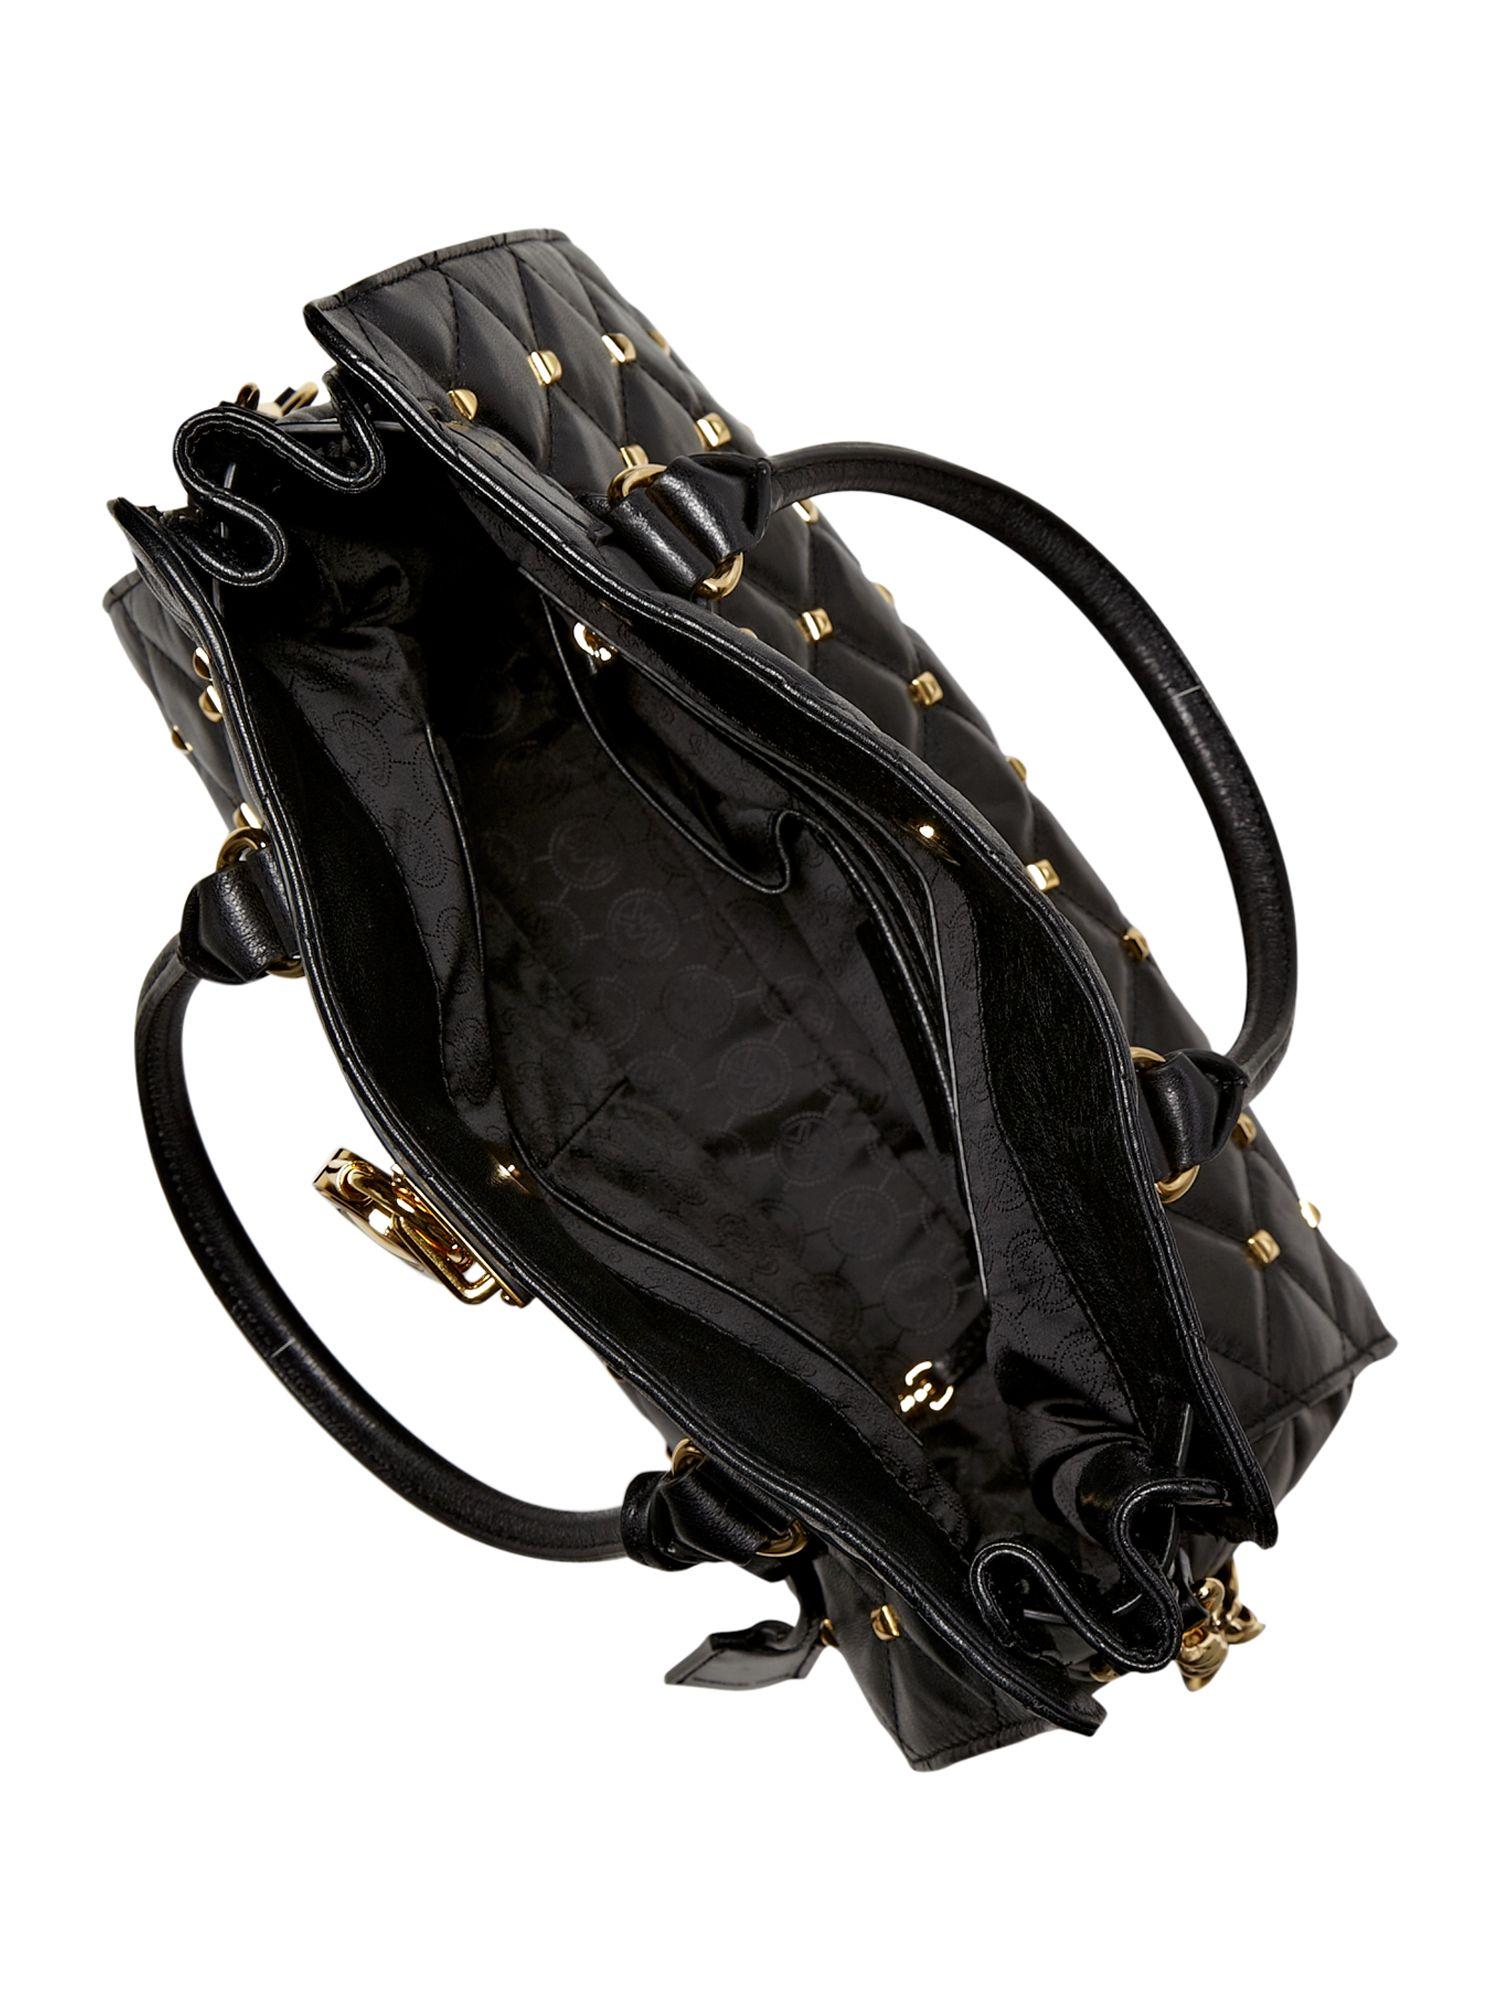 Michael Kors Stud Large Tote Bag in Black